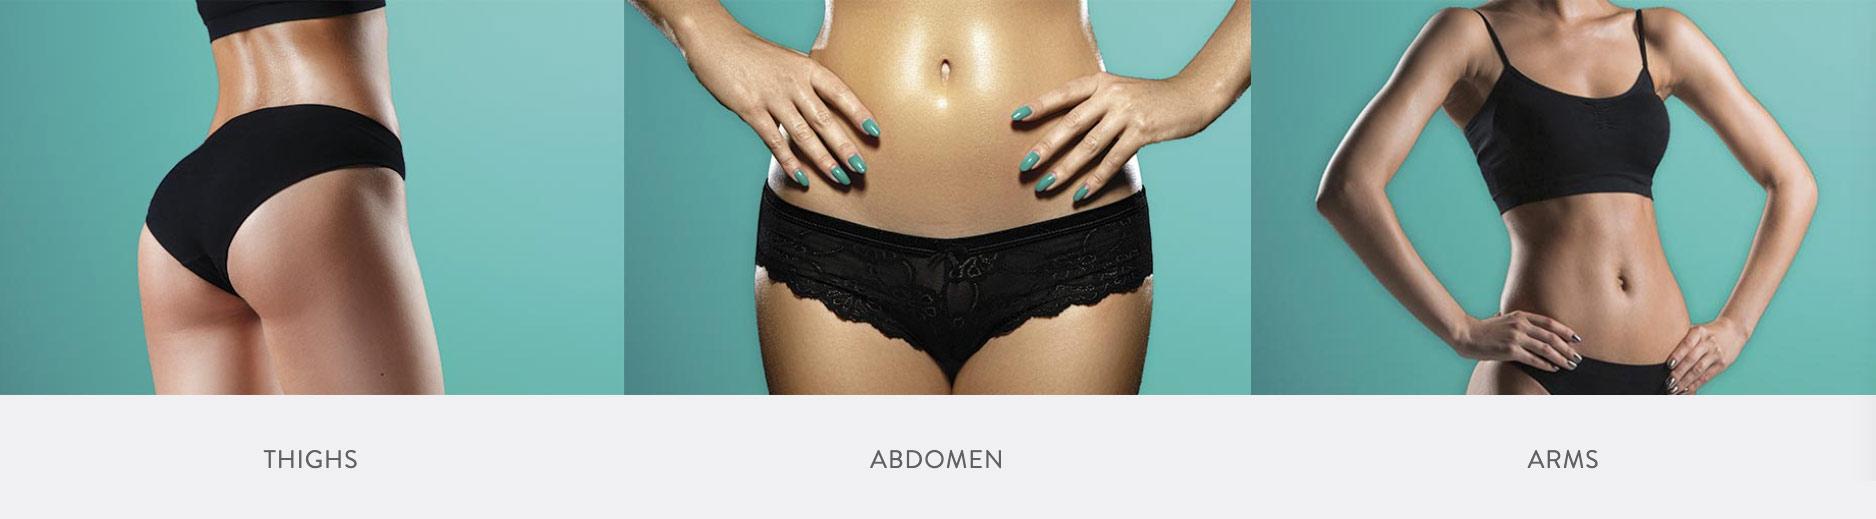 Thighs, Abdomen, Arms